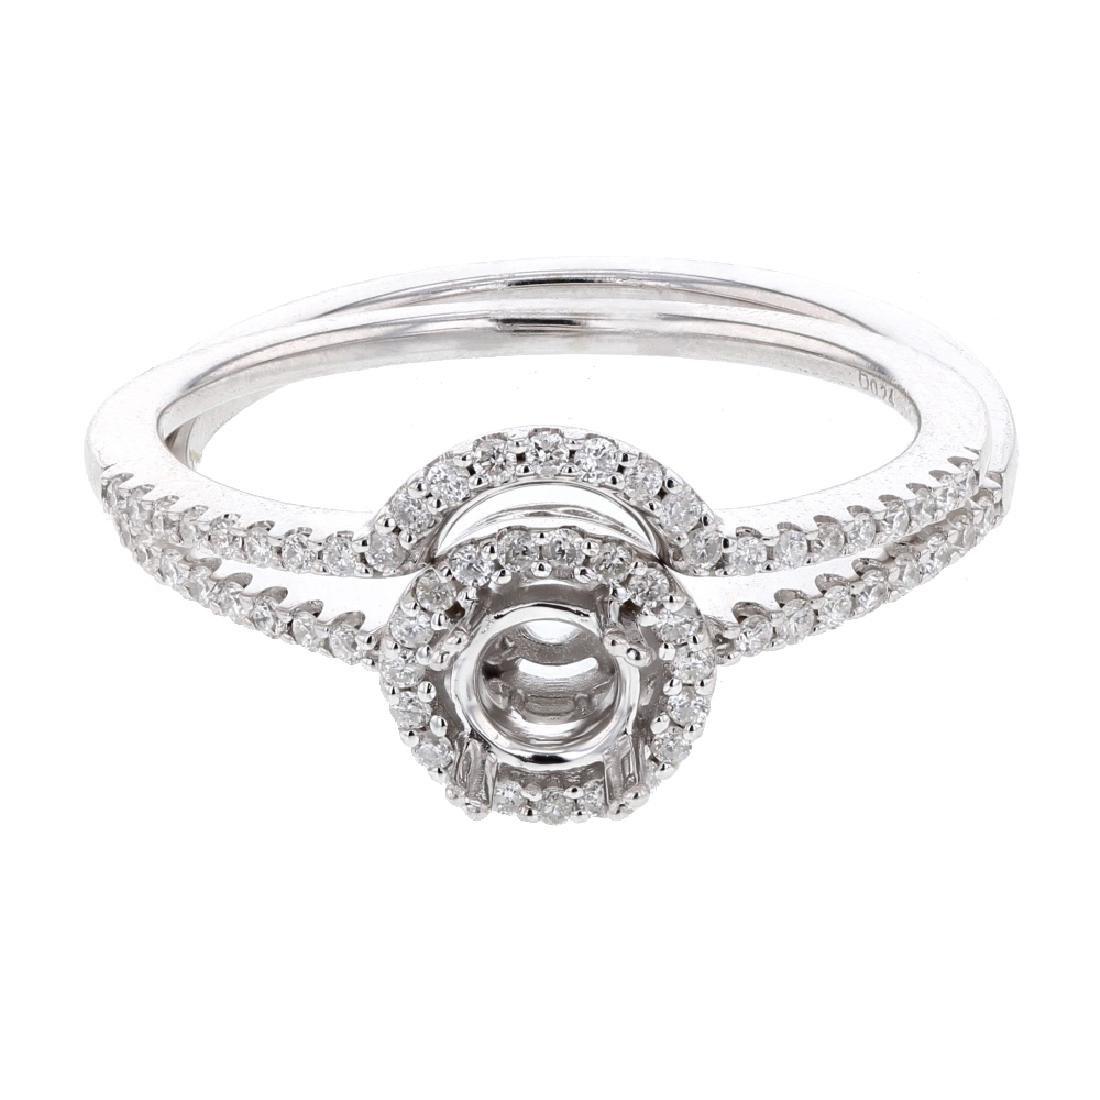 Prong-set Round-cut Diamond Bridal Set in 14K White